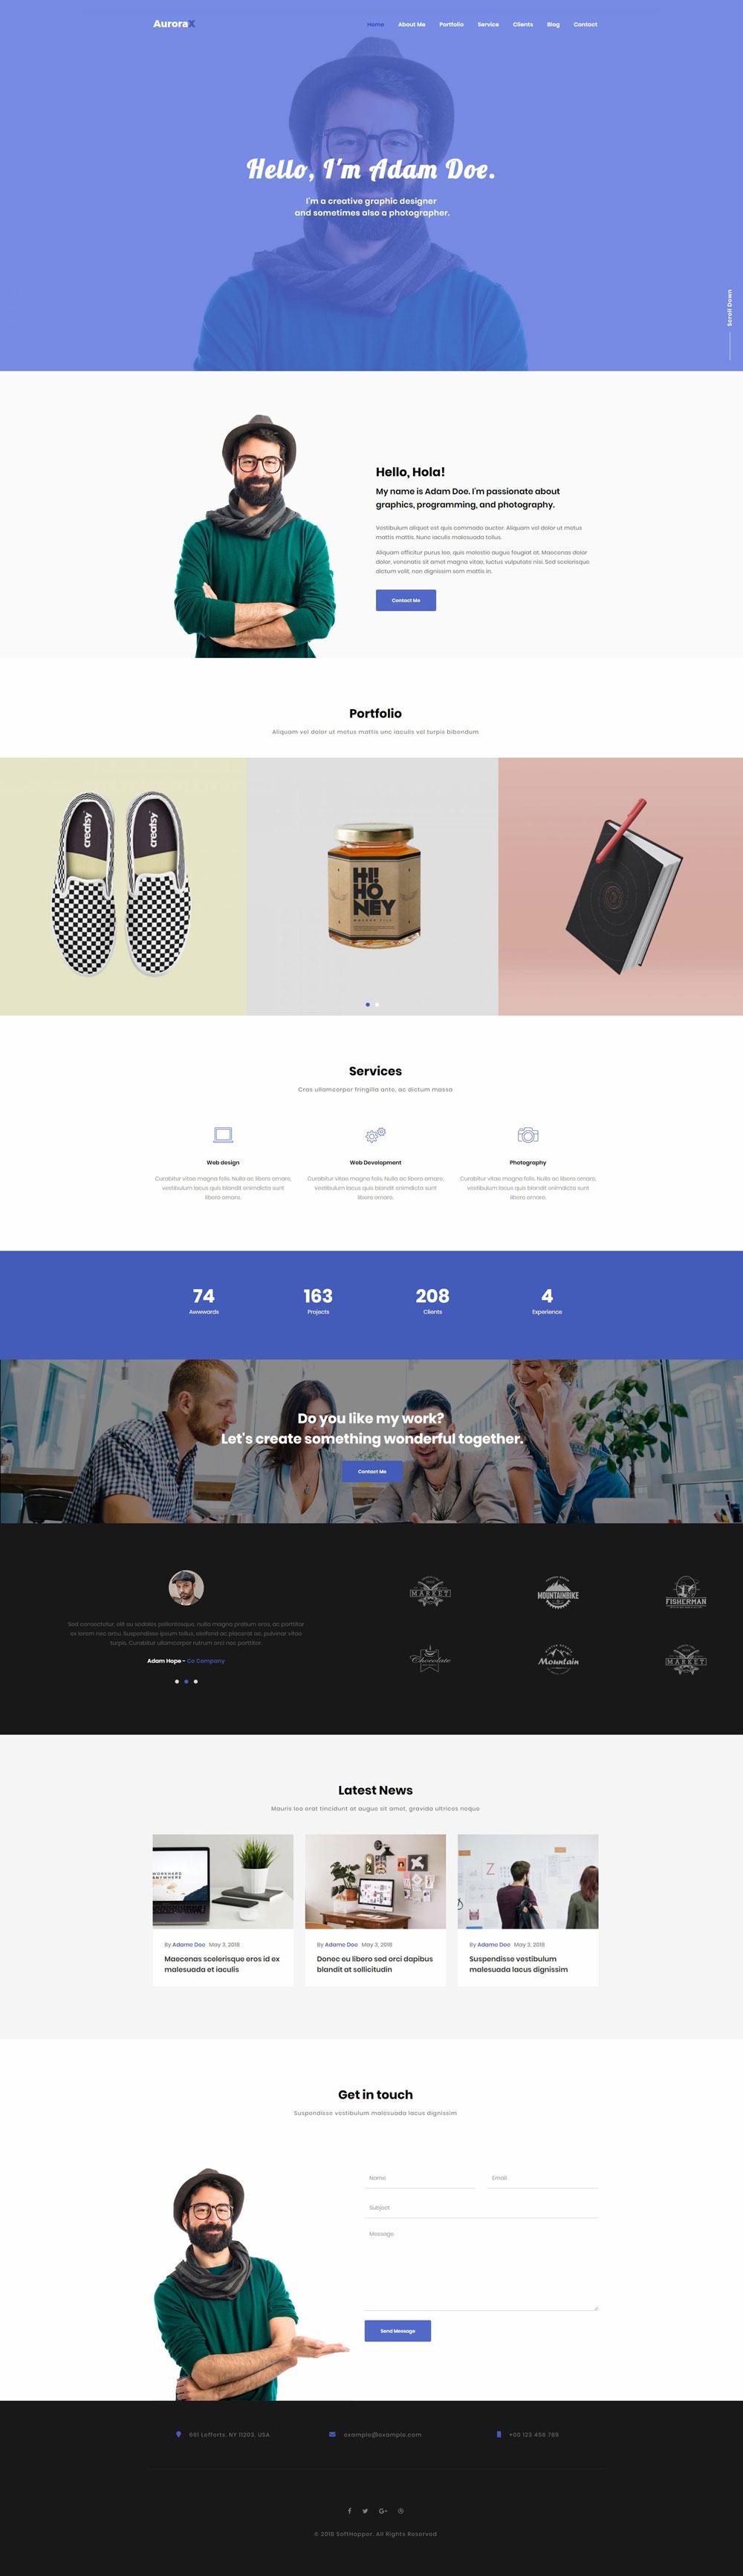 AuroraX - Portfolio on Inspirationde